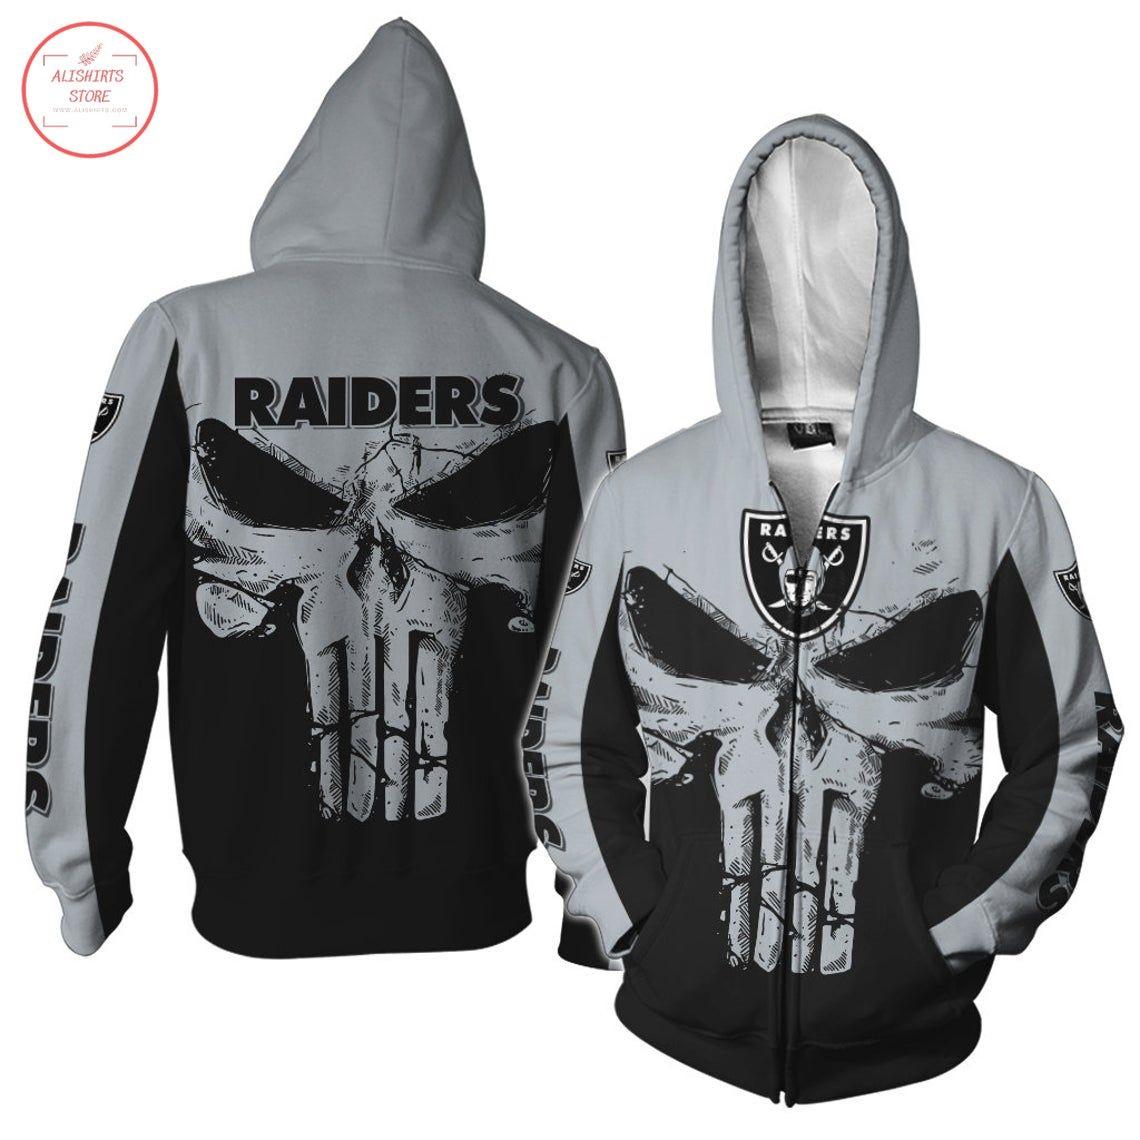 Oakland Raiders NFL Punisher Skull Zip Hoodie